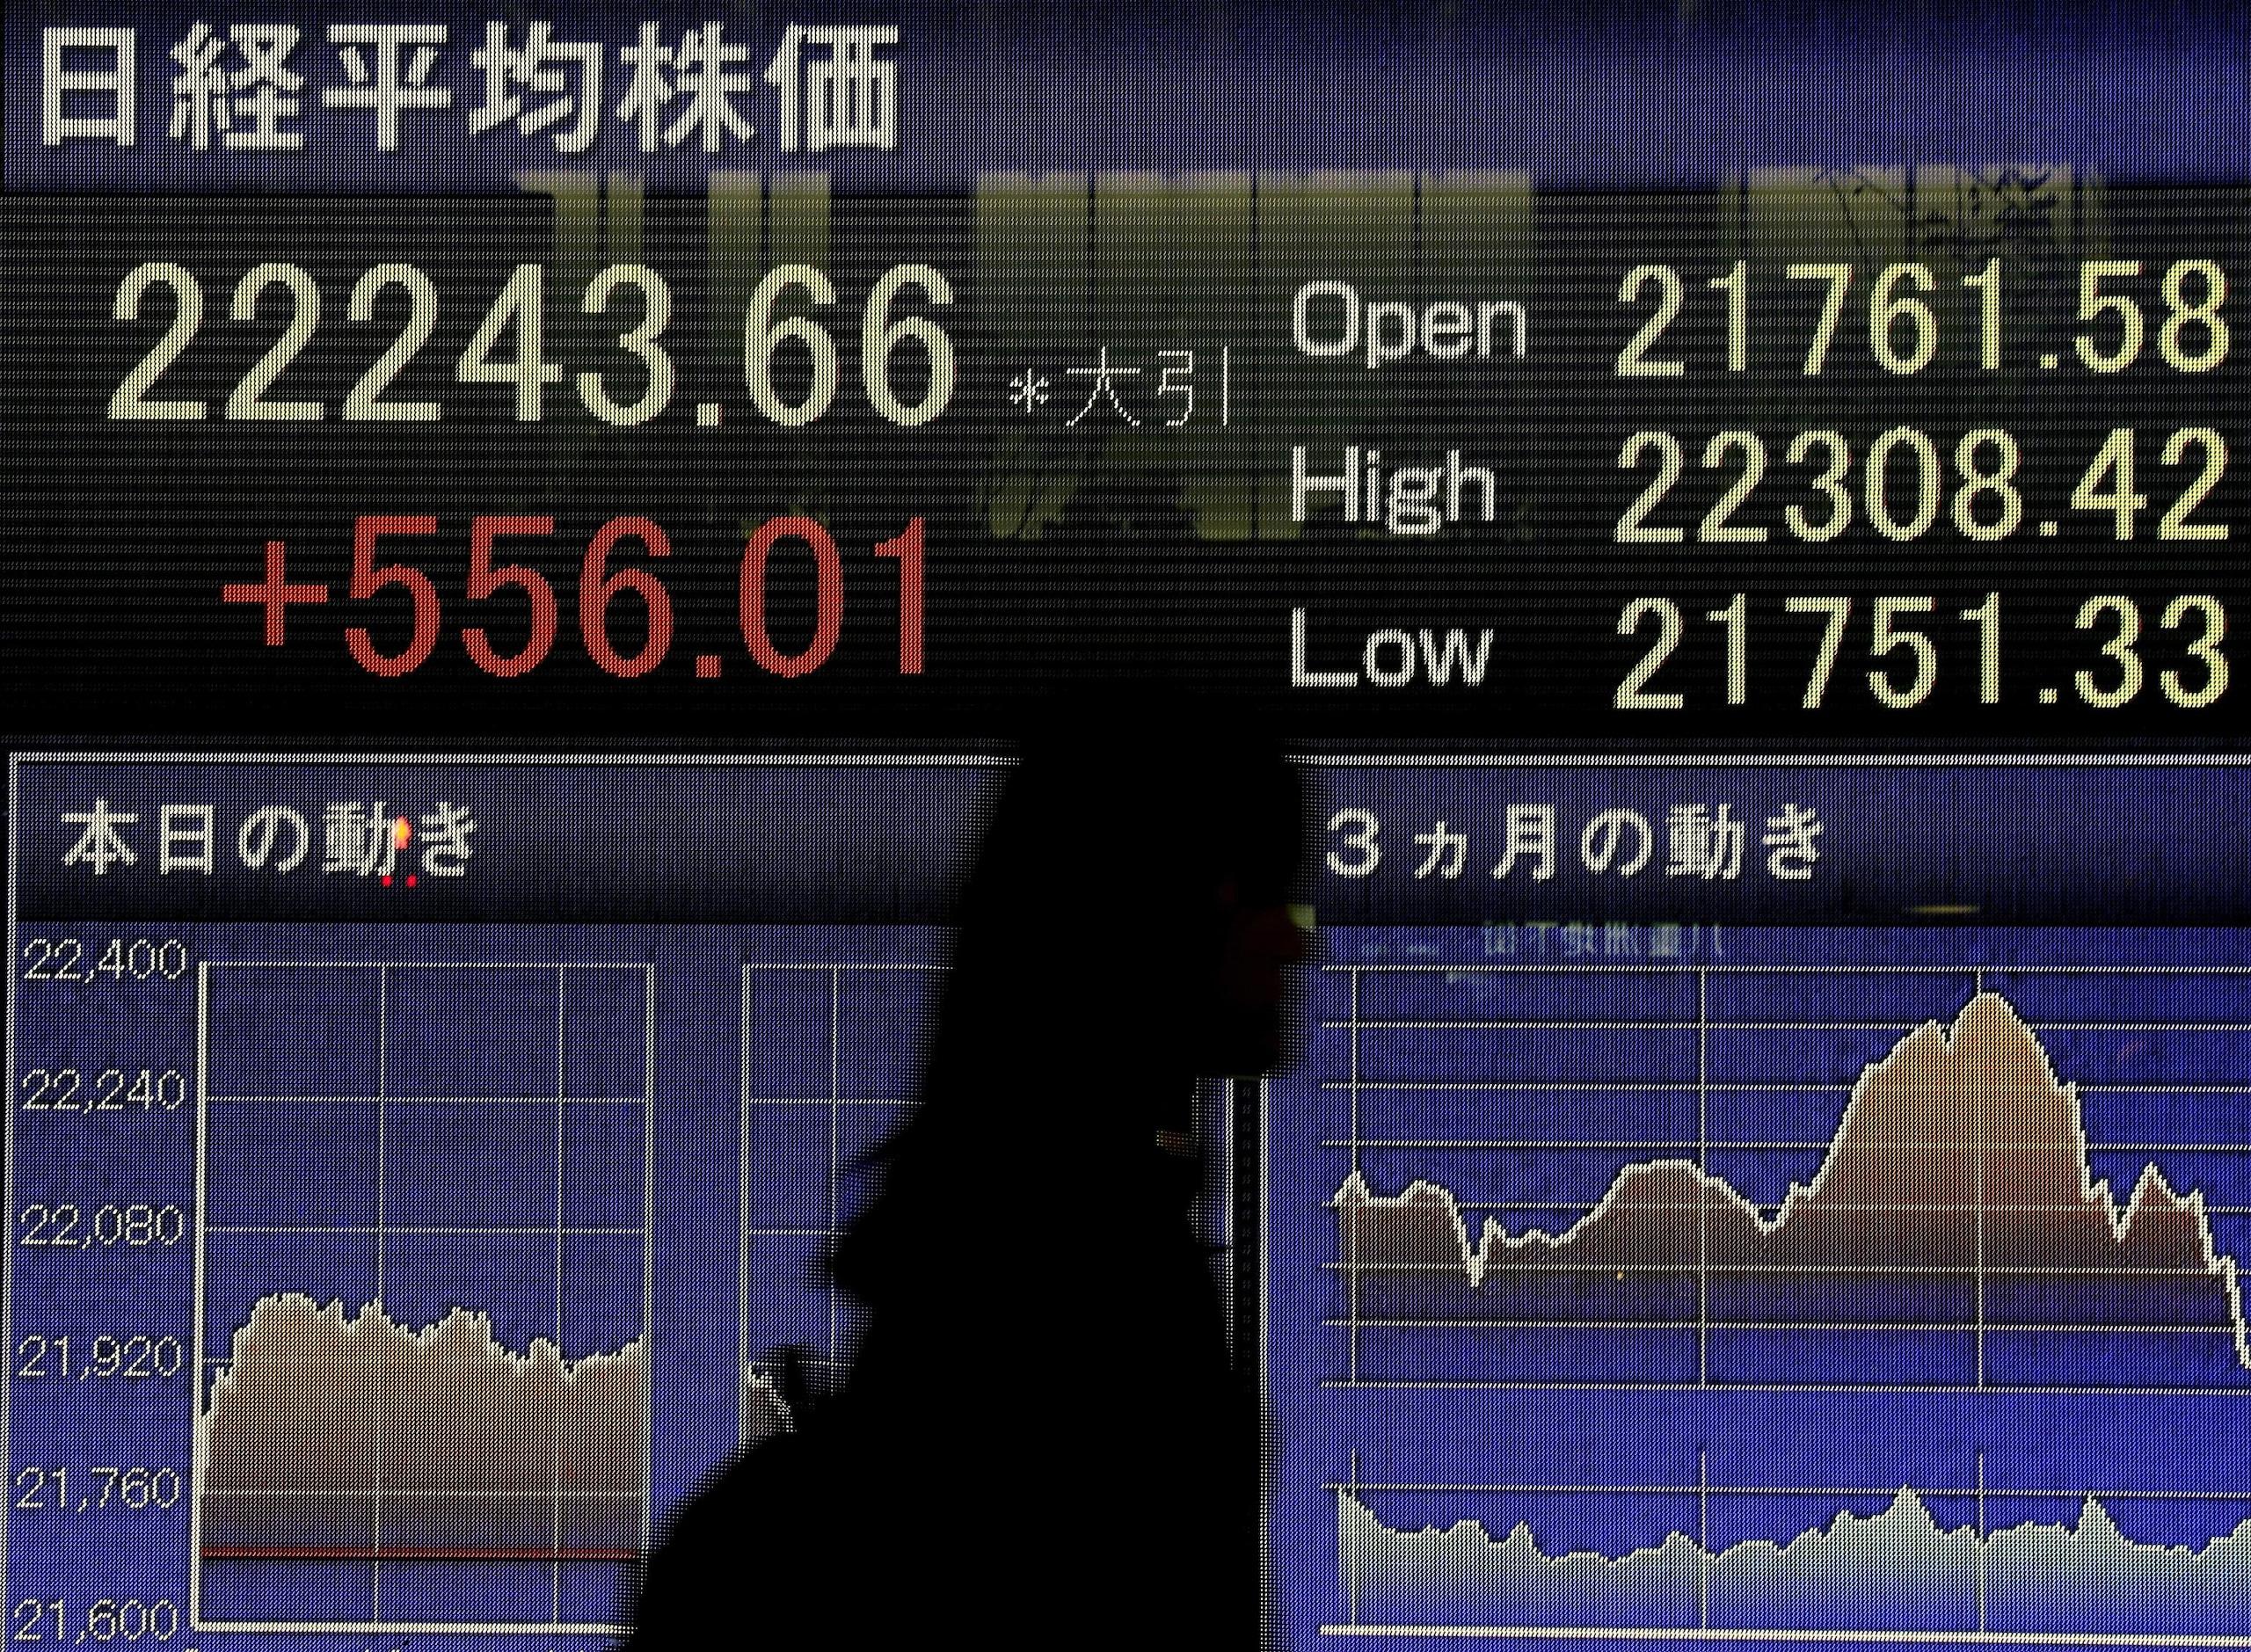 Borsa Tokyo apre in lieve rialzo